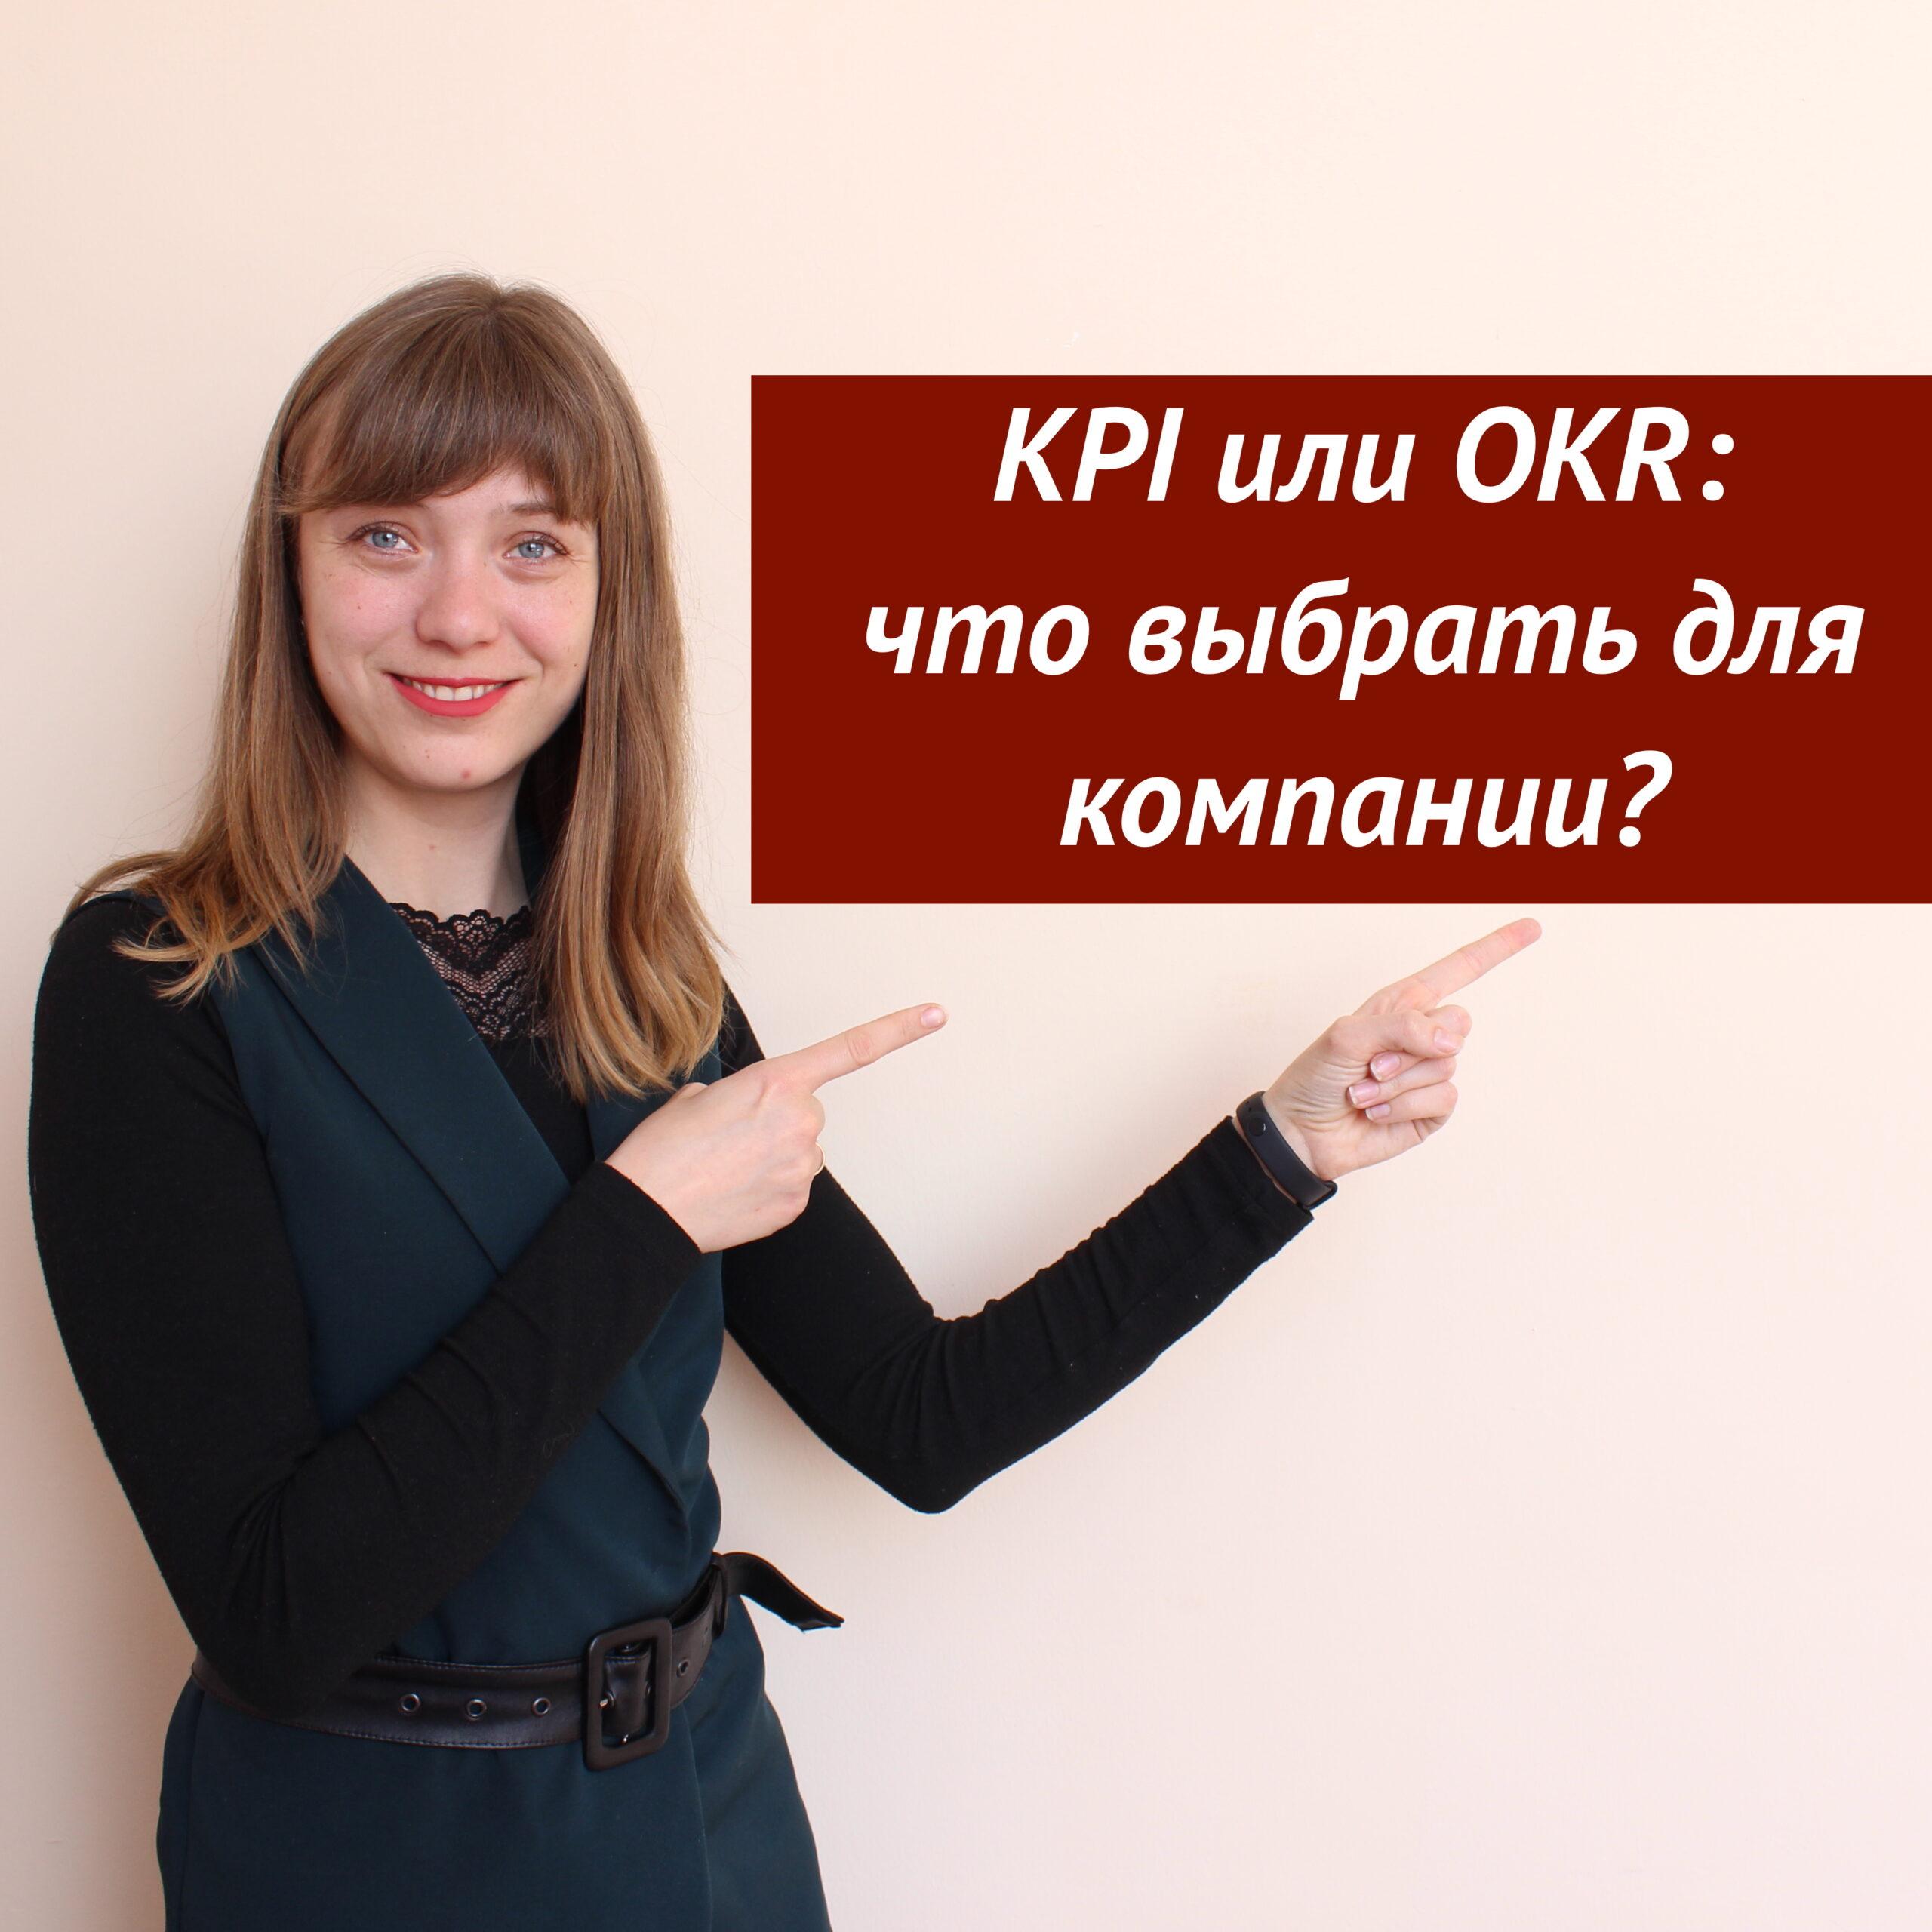 http://dr-shilova.com/wp-content/uploads/2016/01/kpi_okr_kvadrat-scaled.jpg